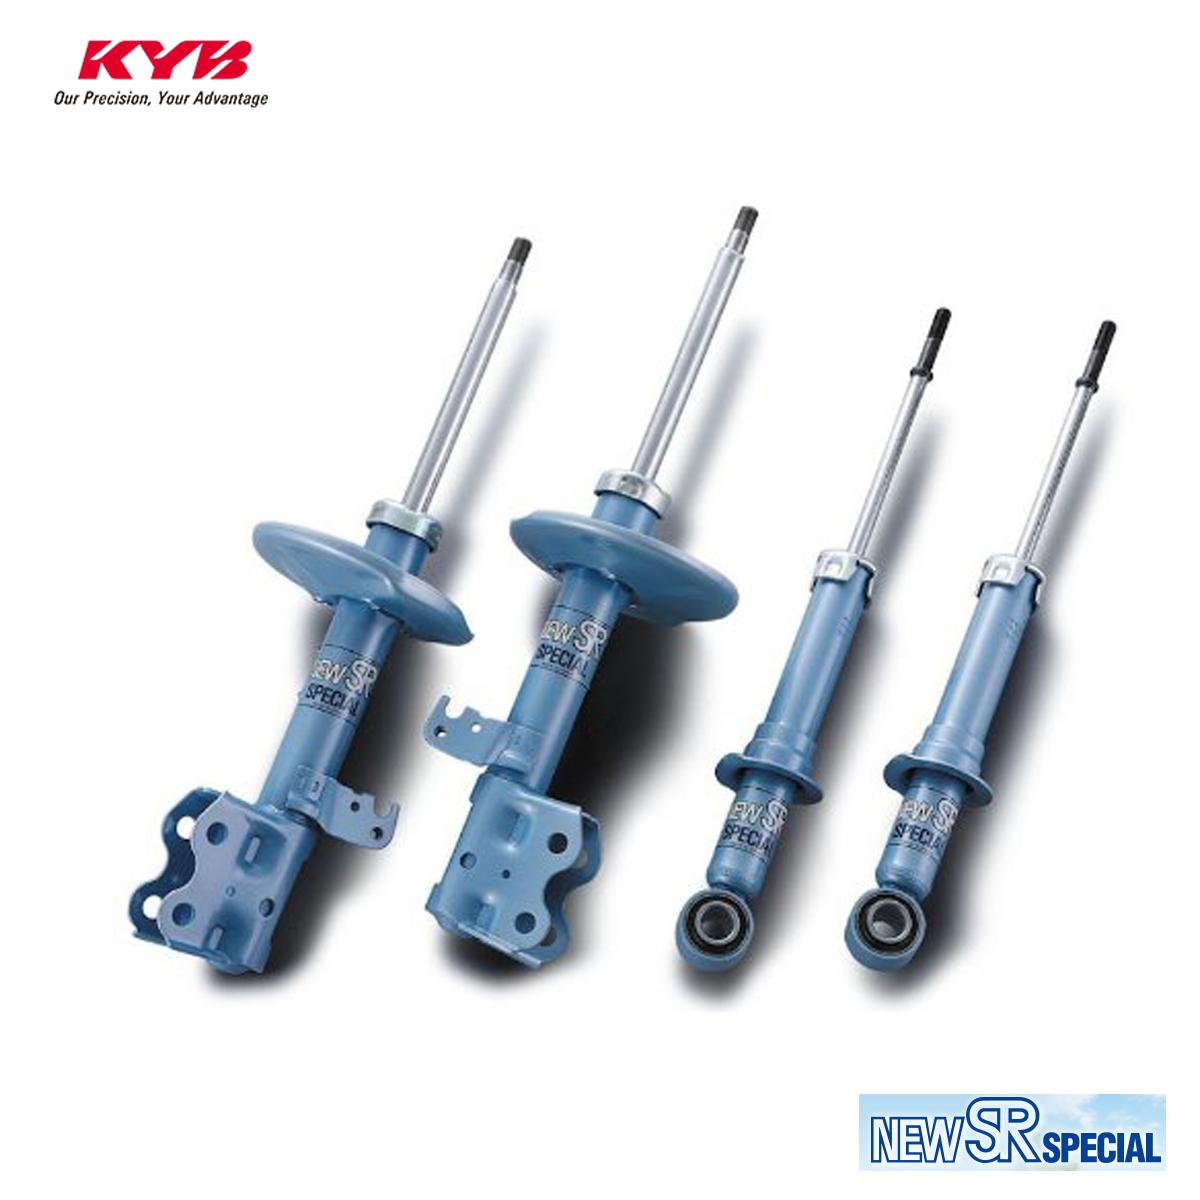 KYB カヤバ ハイエース レジアスエース KZH106G ショックアブソーバー 1台分 NEW SR SPECIAL NS-20292070 配送先条件有り